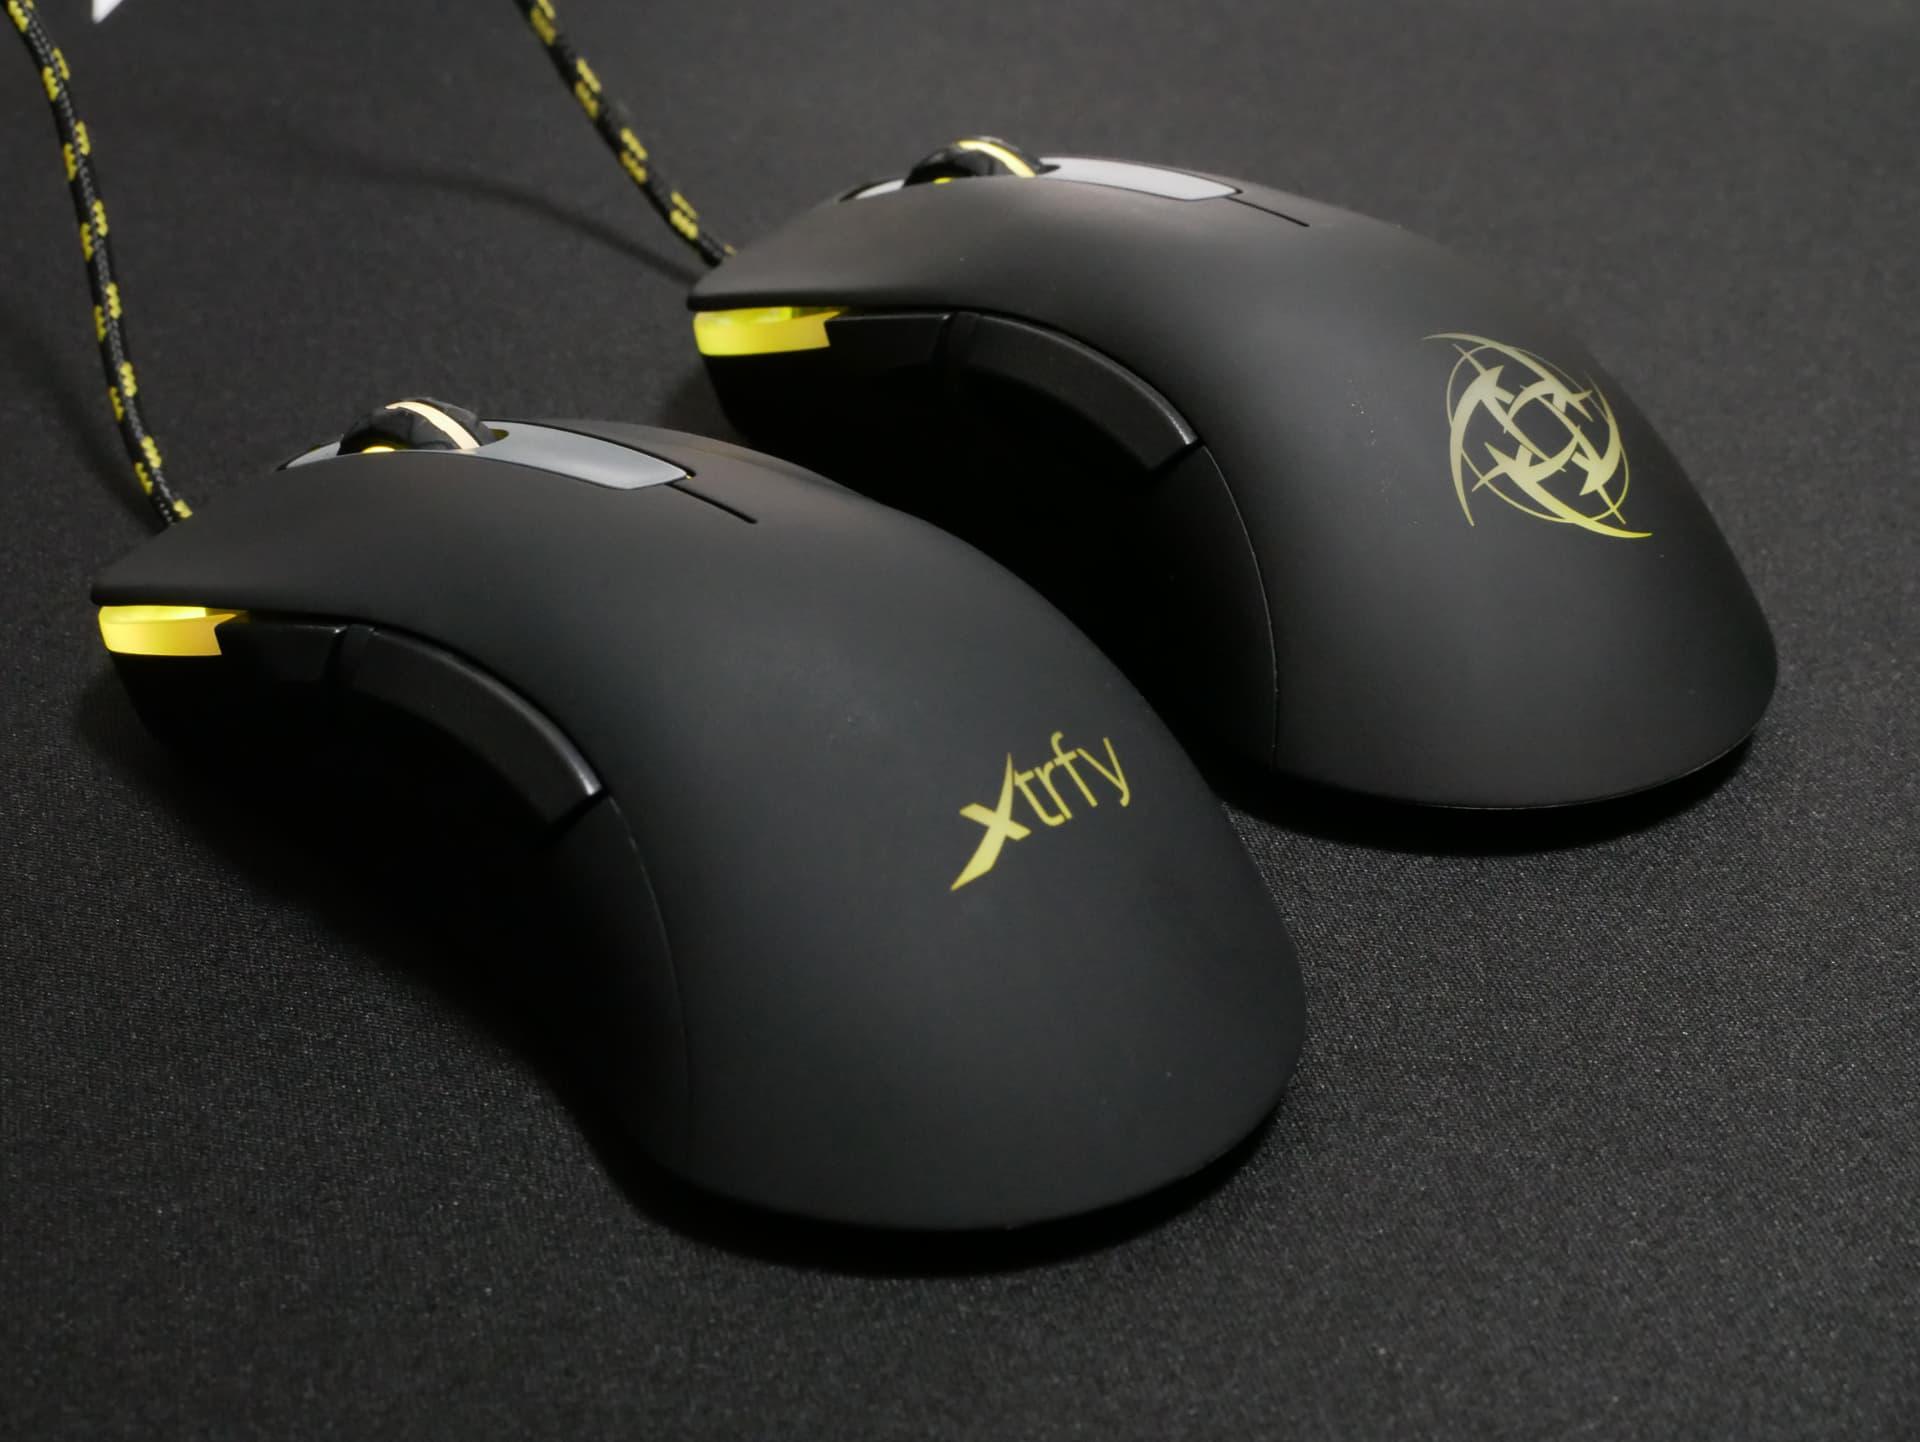 「Xtrfy M1」レビュー。手に自然にフィットする左右非対称ゲーミングマウス